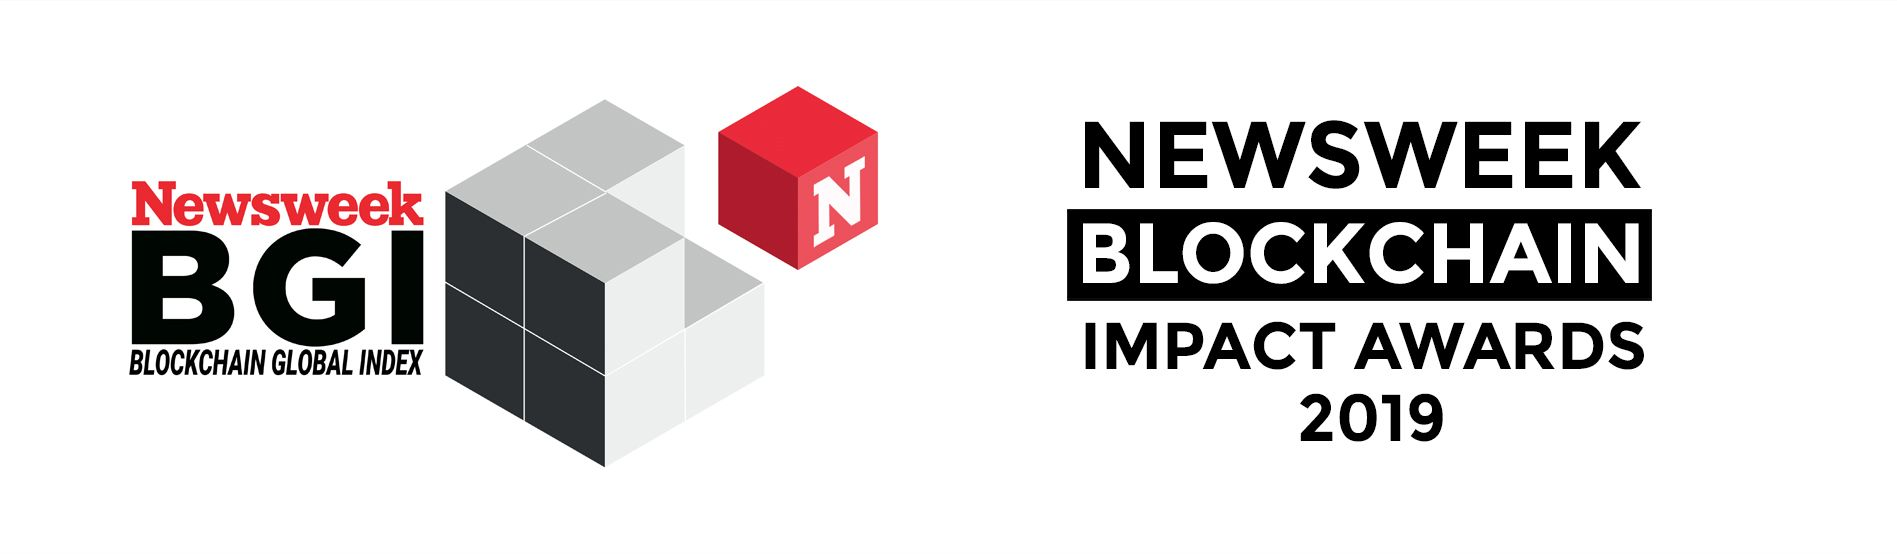 Blockchain Impact Awards 2019